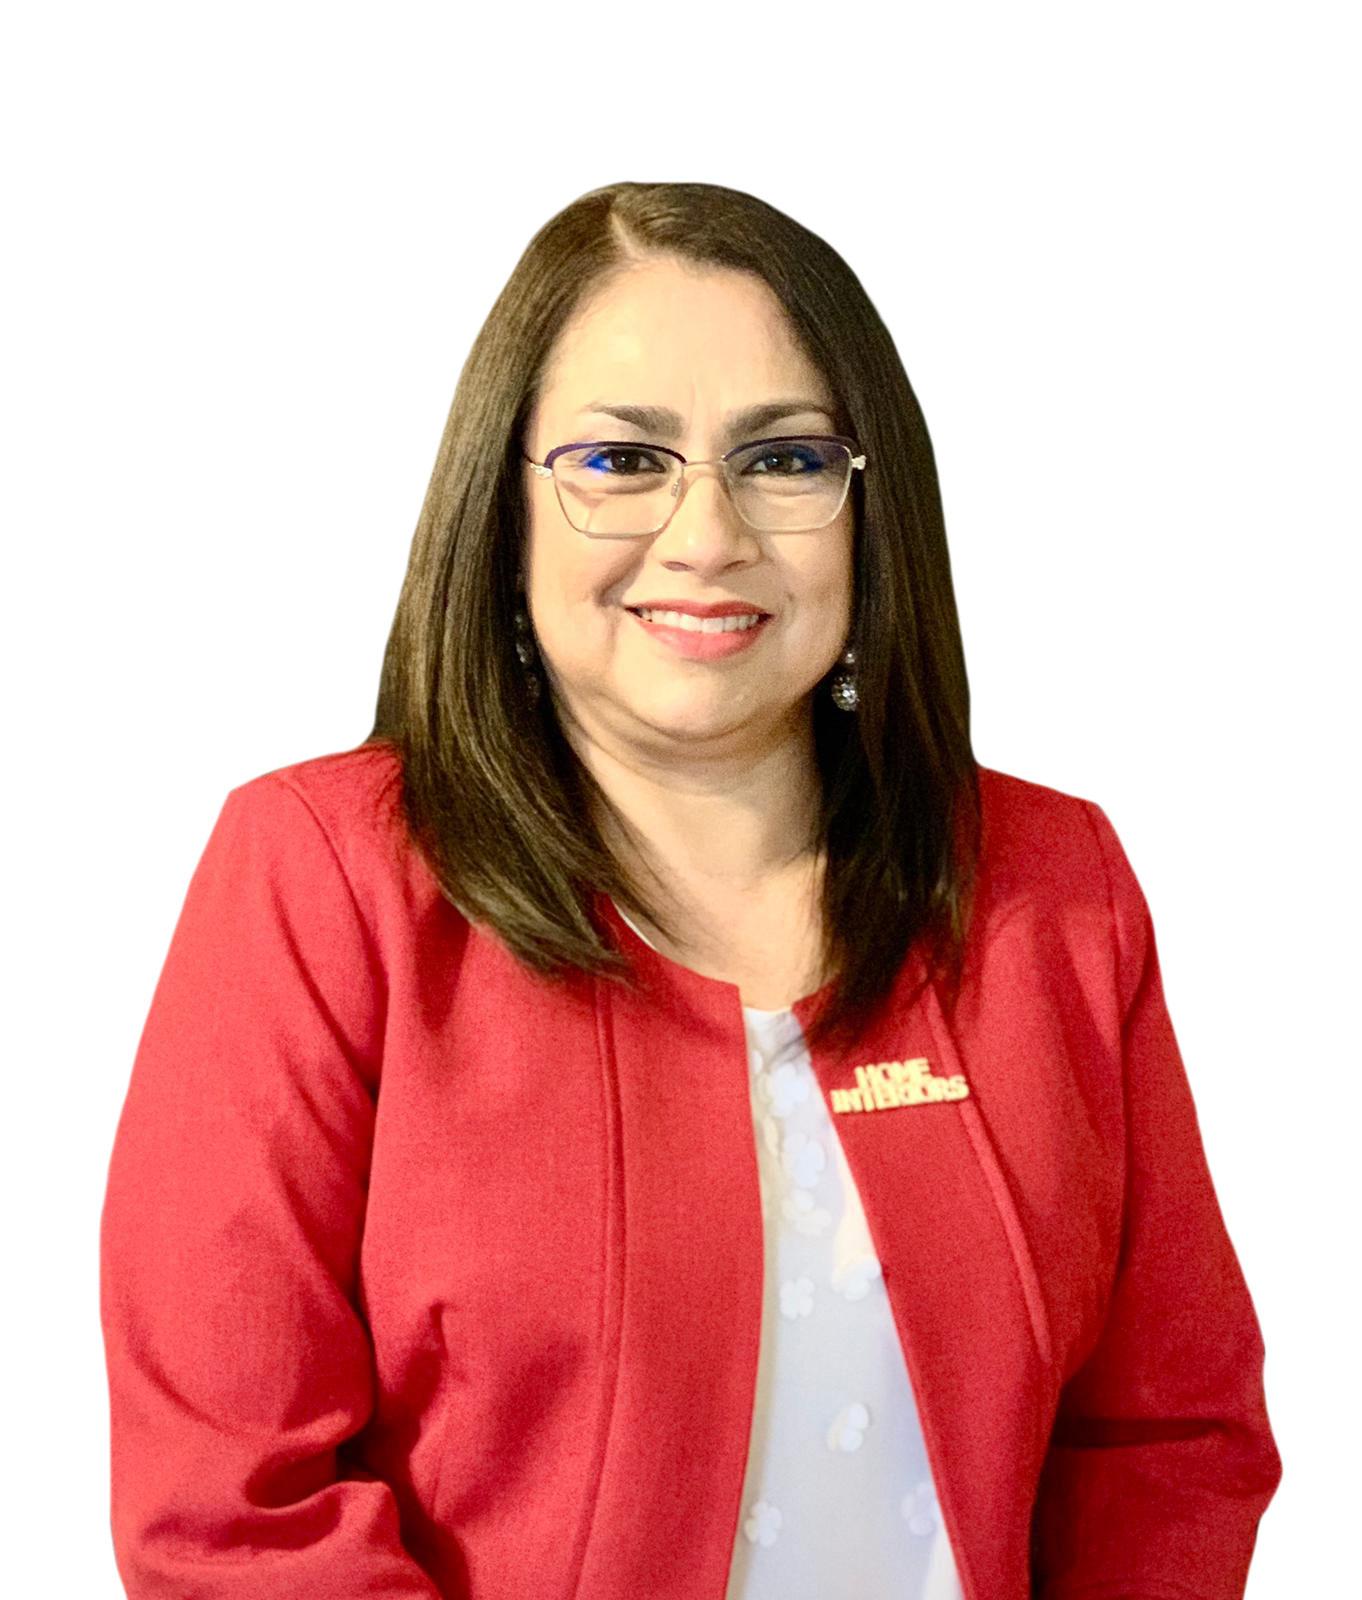 Sonia Hernandez